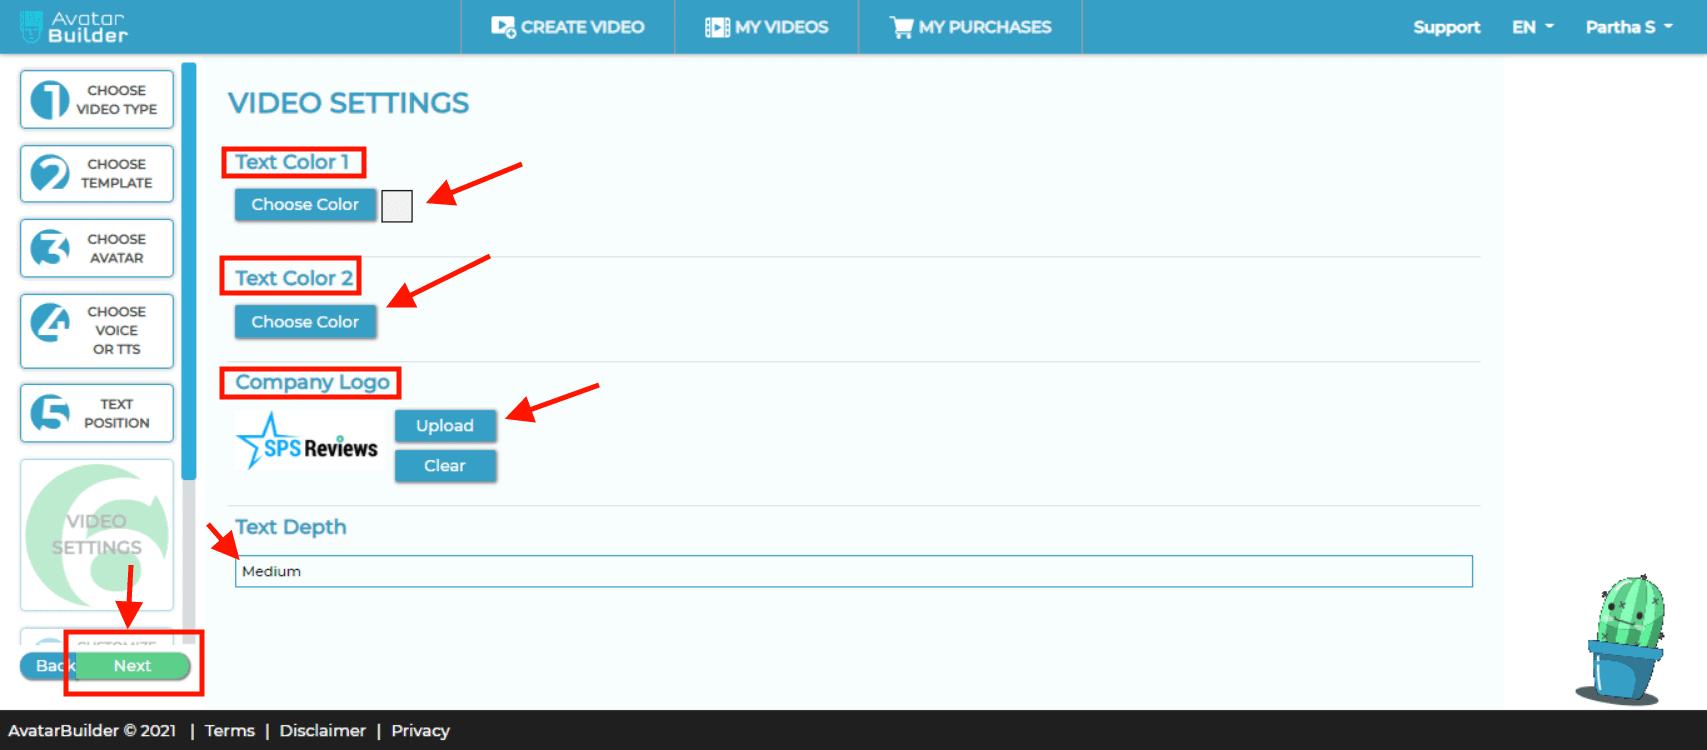 avatarbuilder - upload your company logo